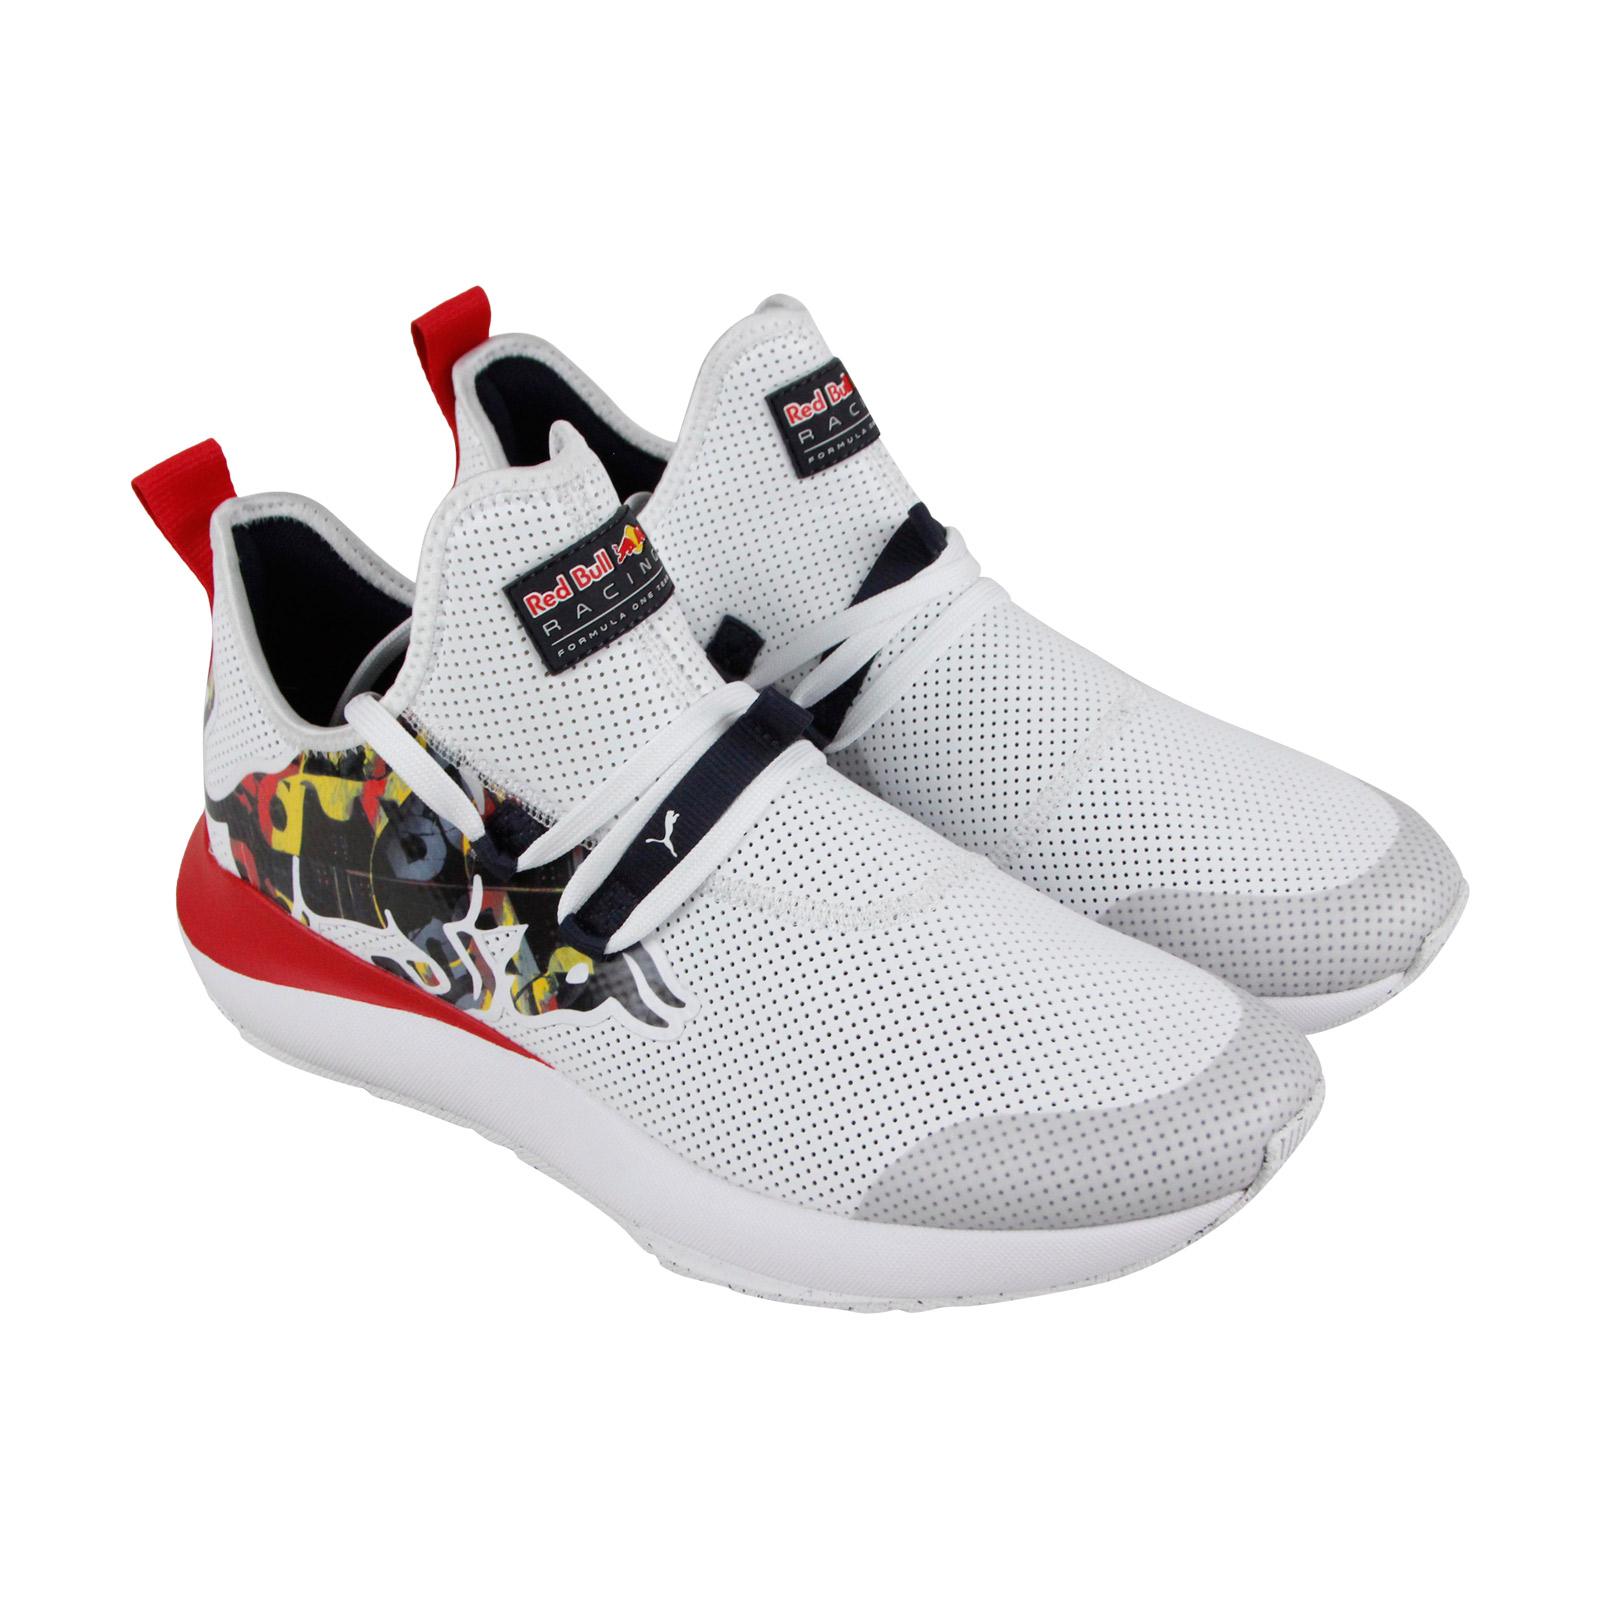 Puma Rbr Uomo Evo Cat Ii Bulls Uomo Rbr White Textile  Mesh Athletic Training Shoes 7a8bf0